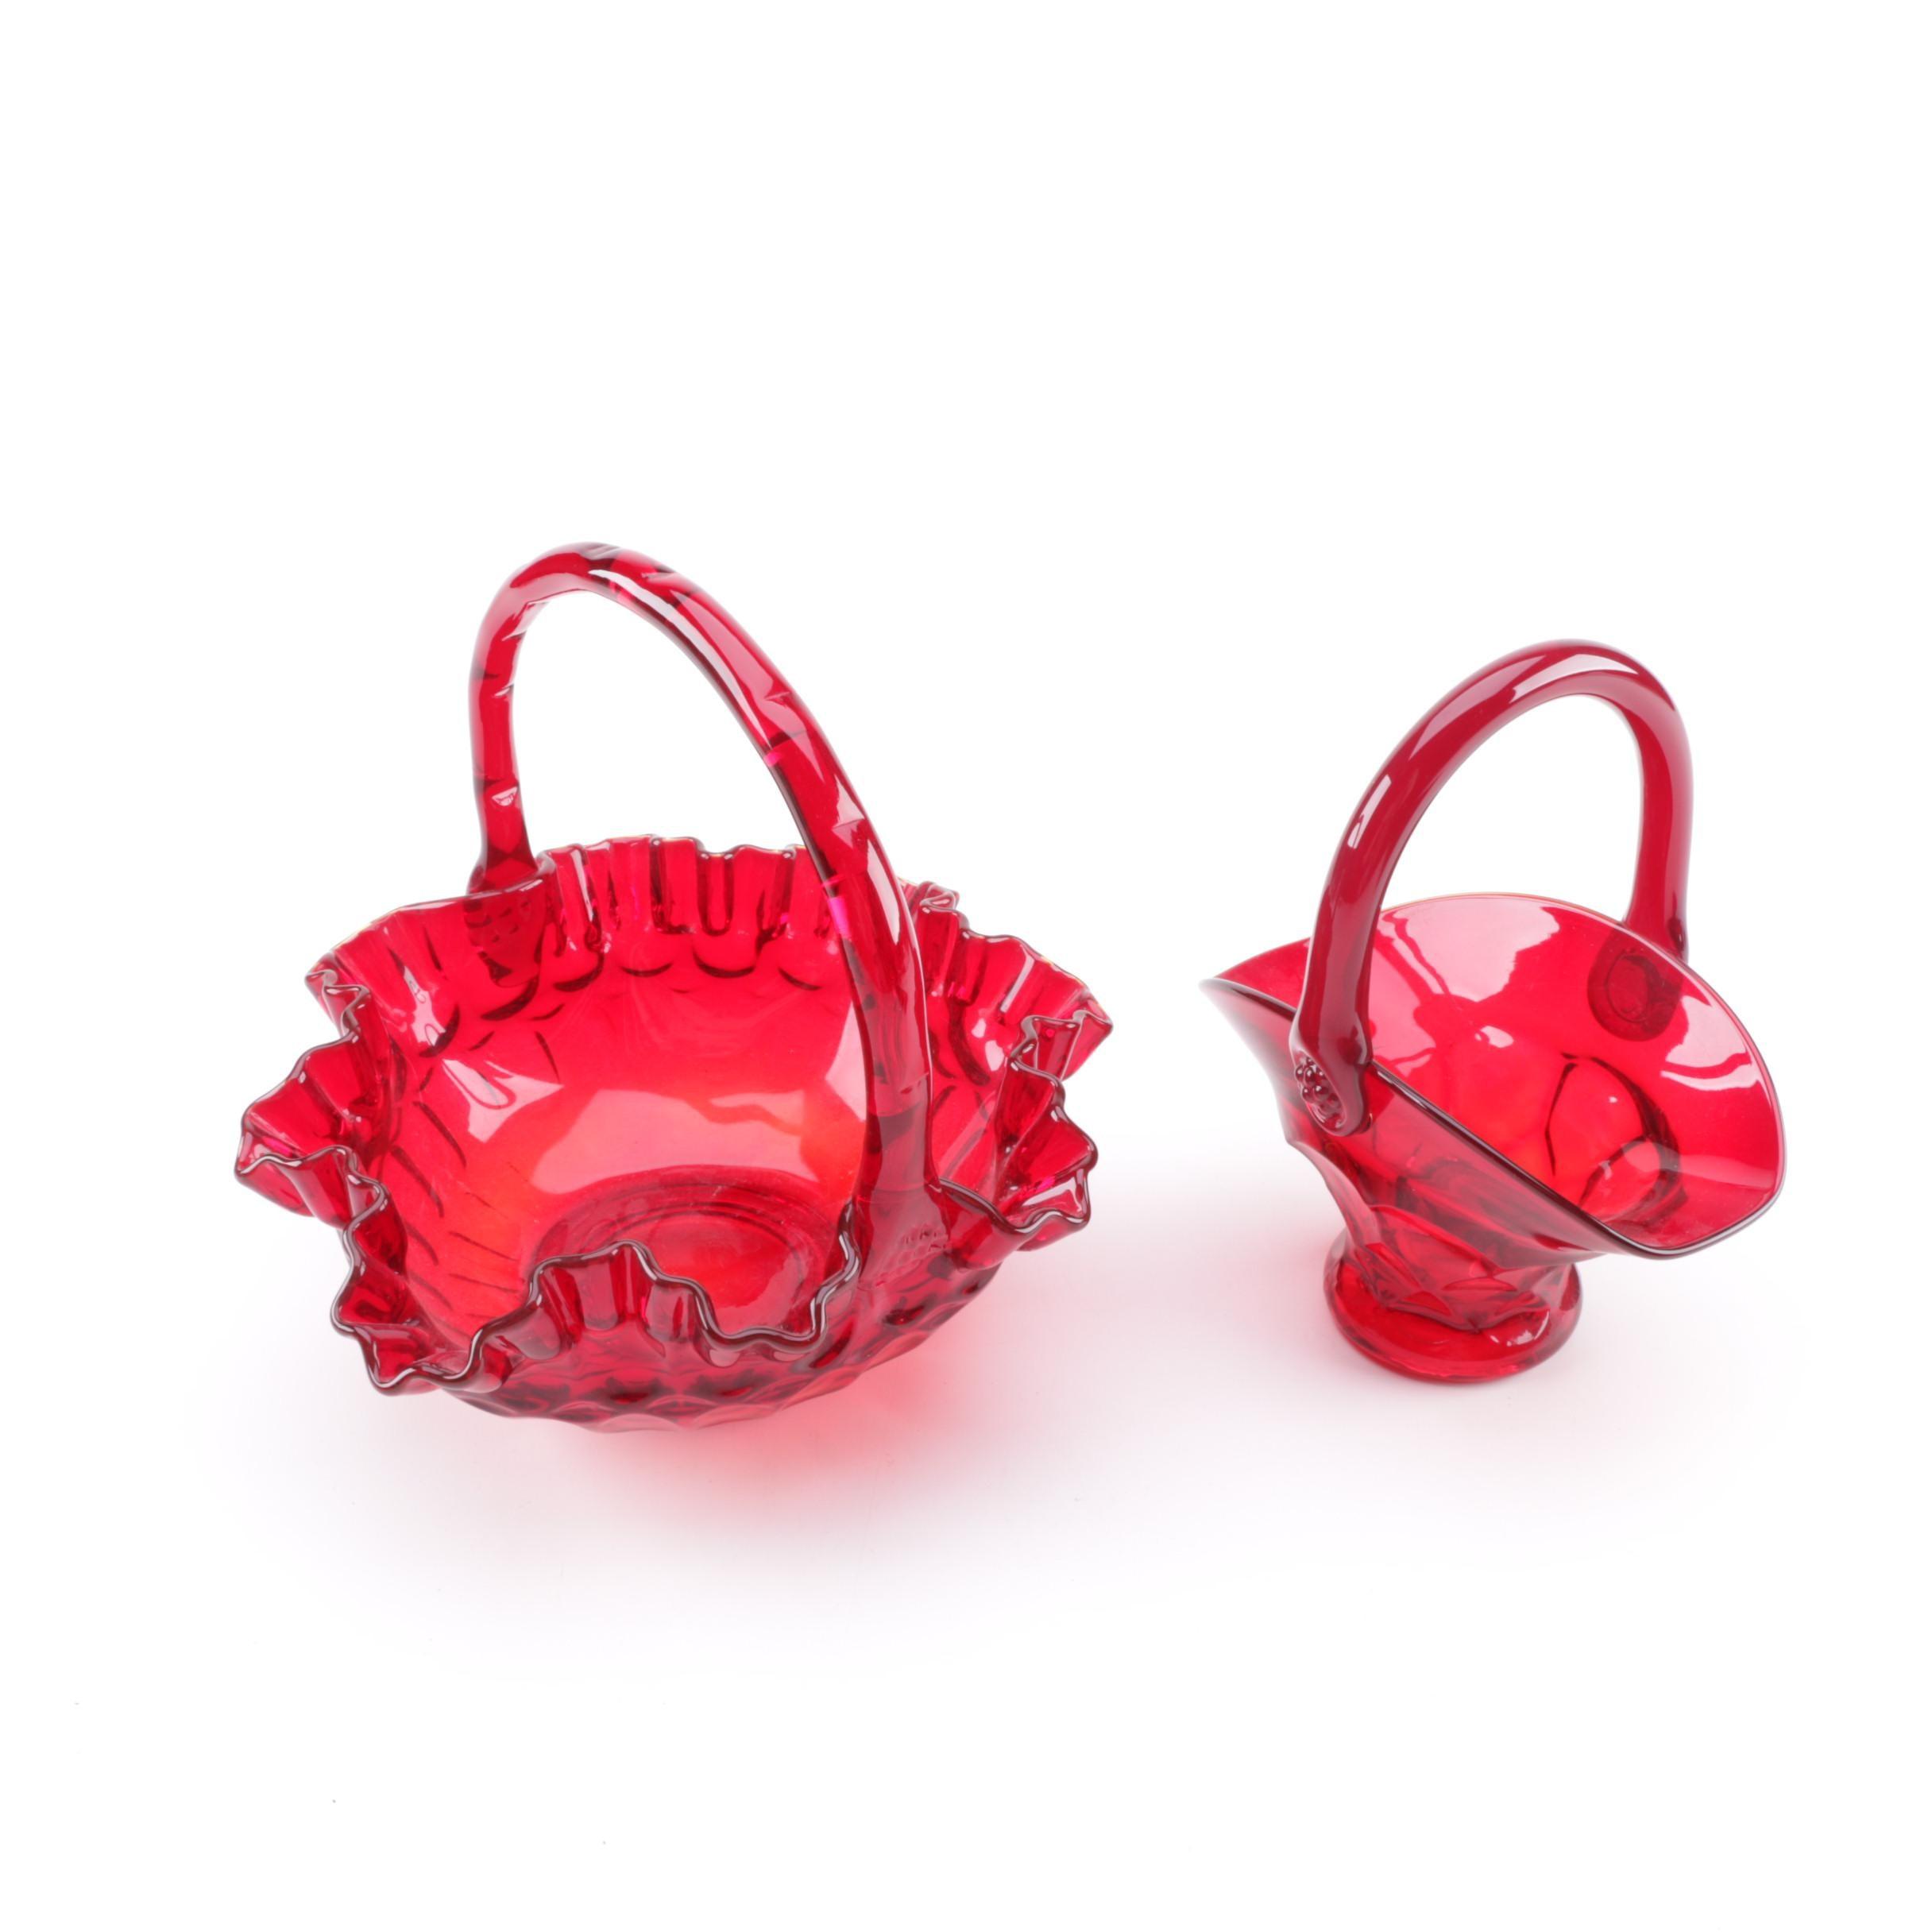 Fenton Style Glass Baskets